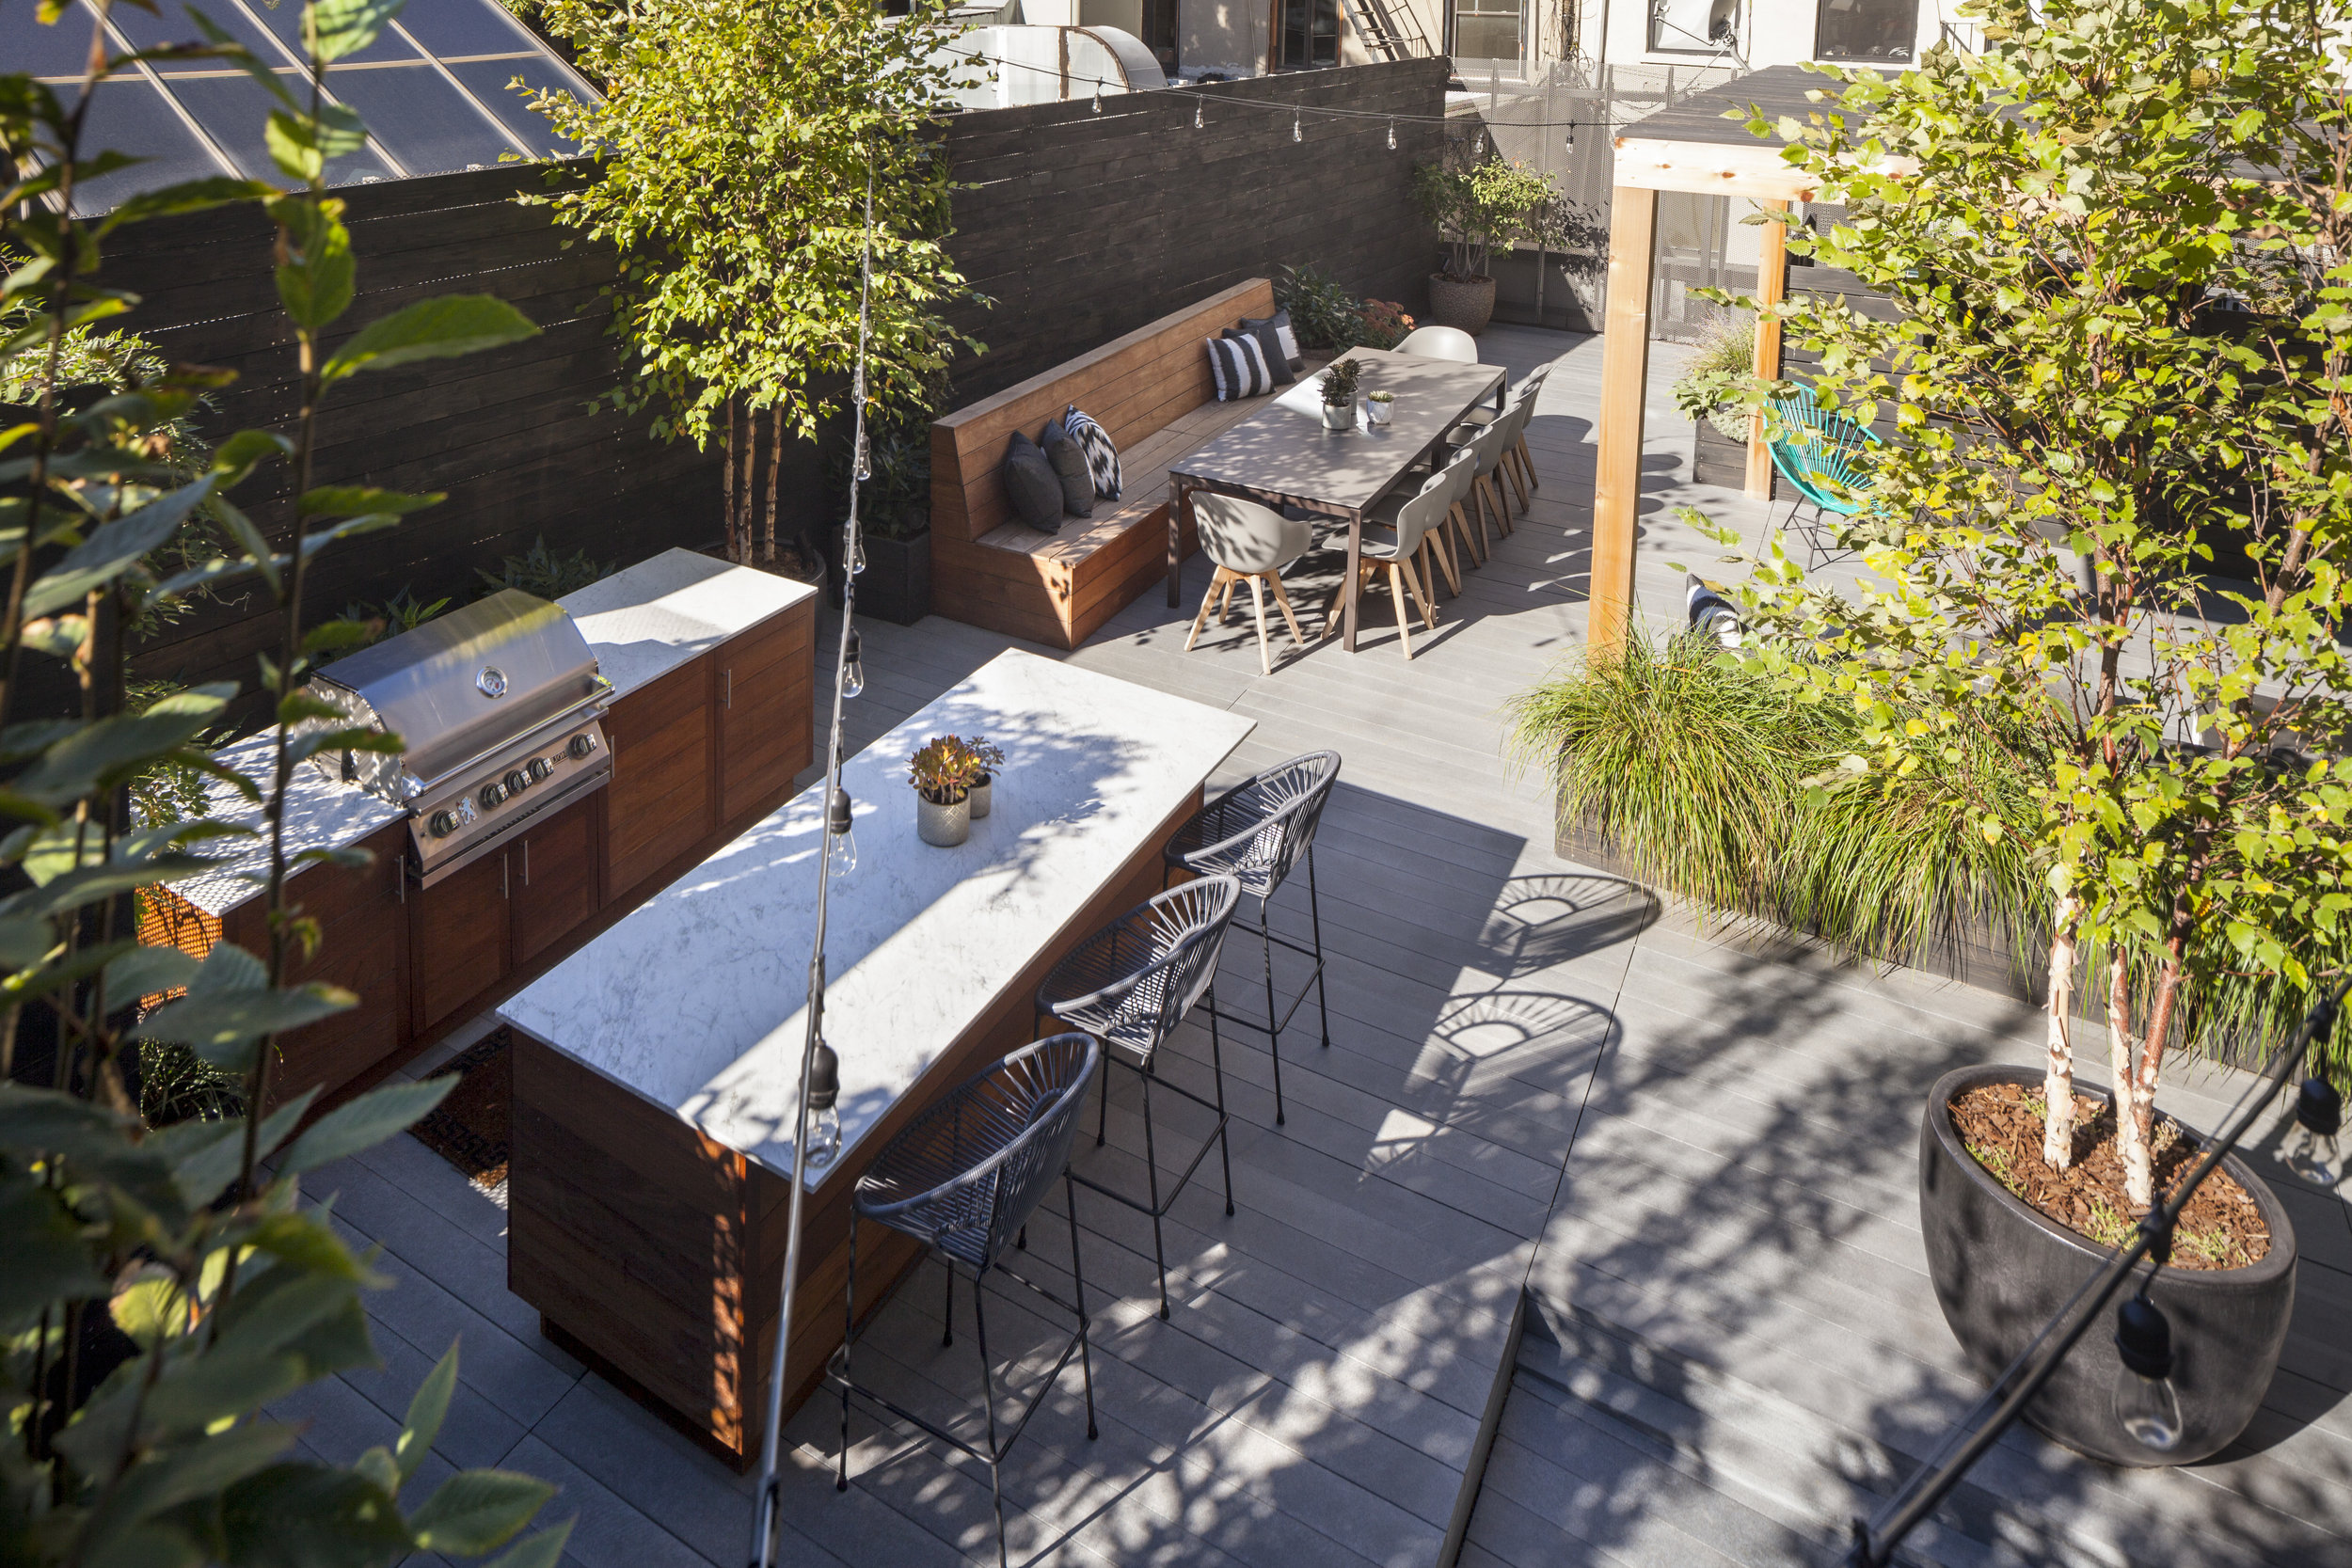 outdoor_kitchen_area_brooklyn.jpg